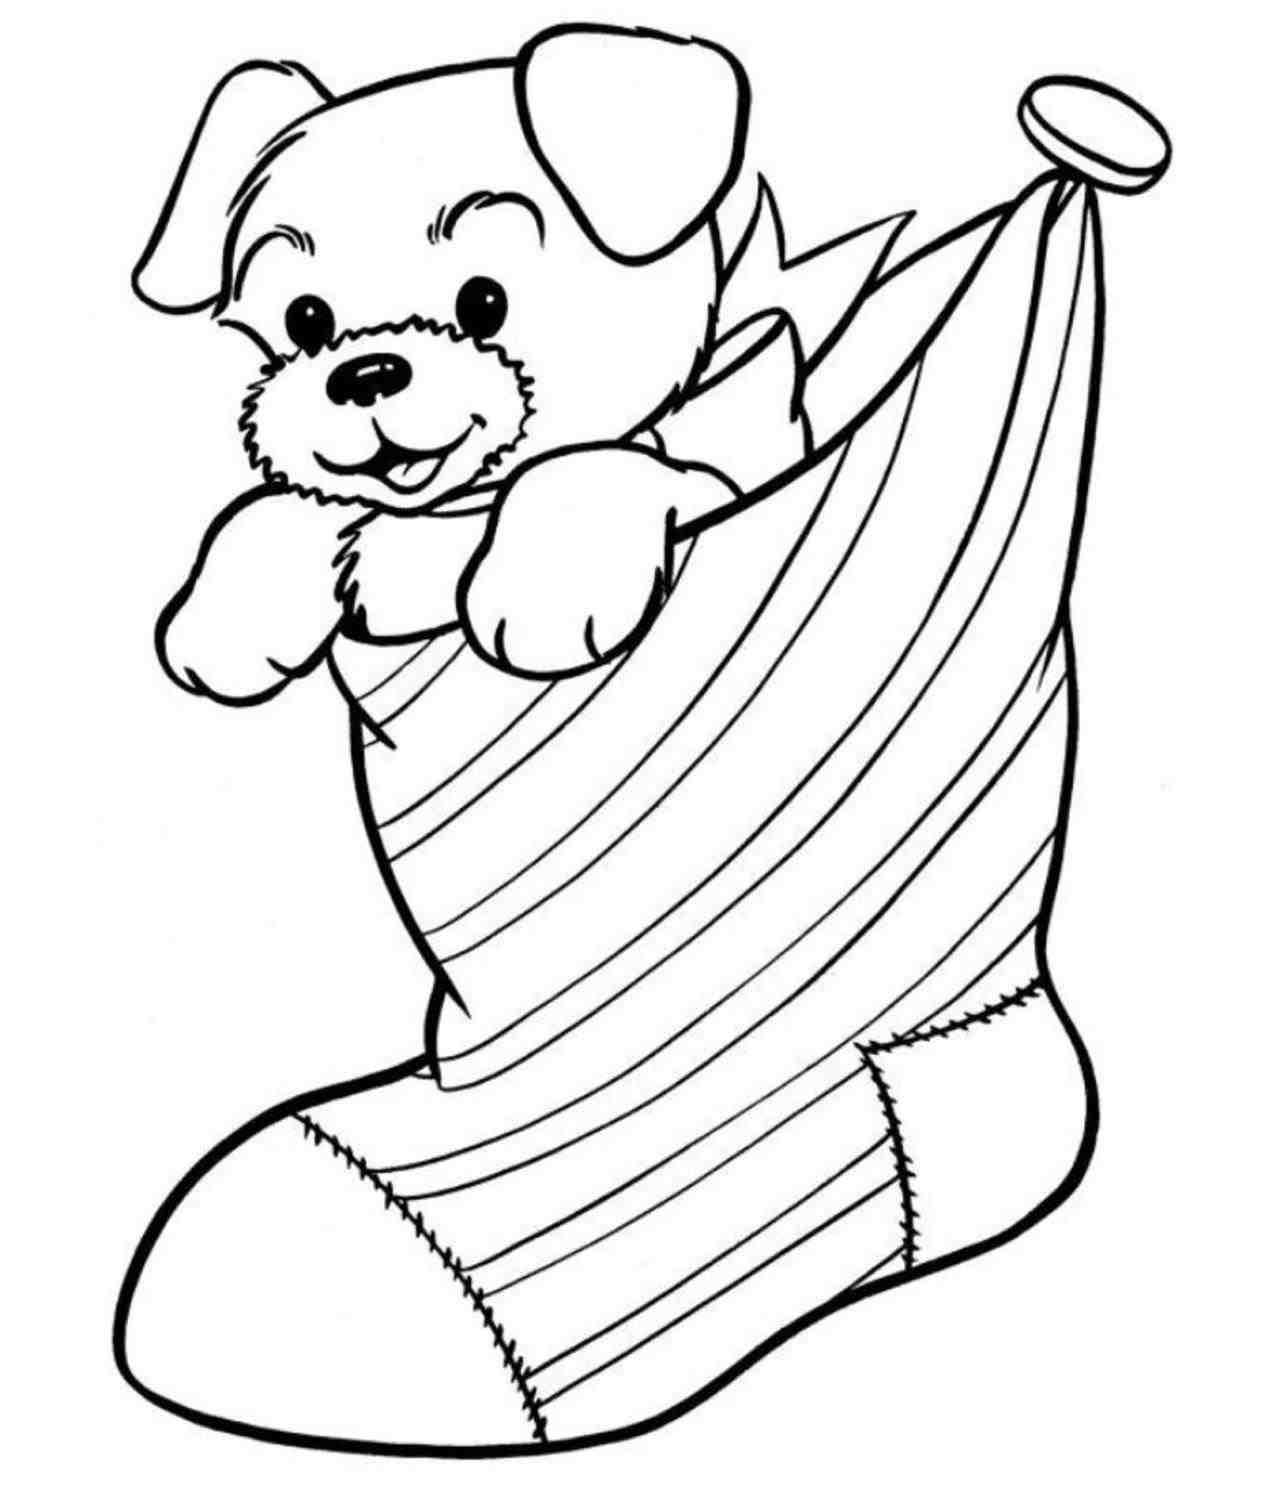 1280x1485 Christmas Dog Drawing Cheminee.website